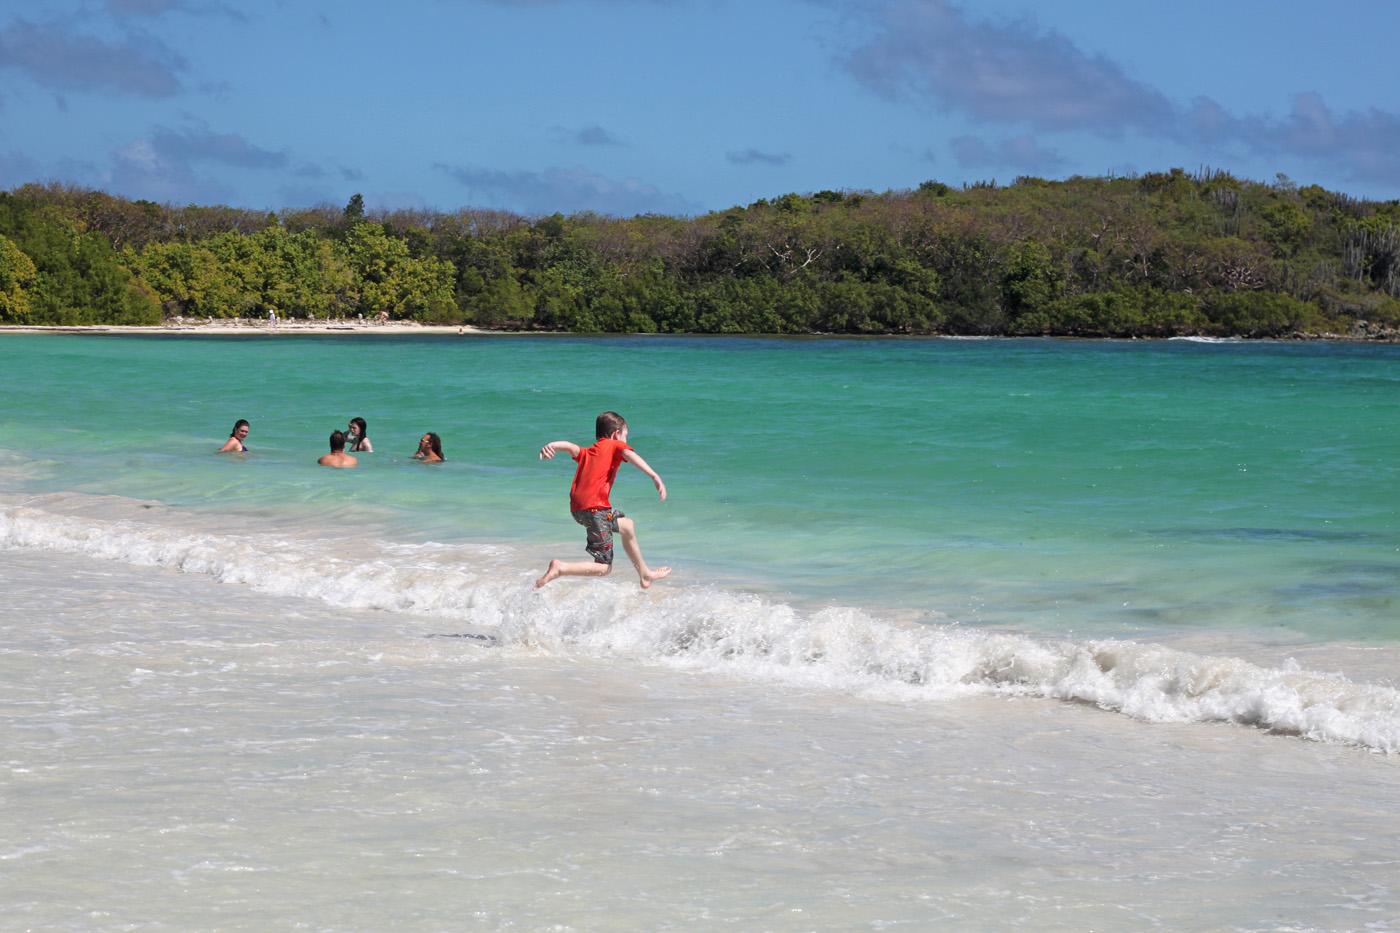 back in the water! Plata Prieta, Vieques